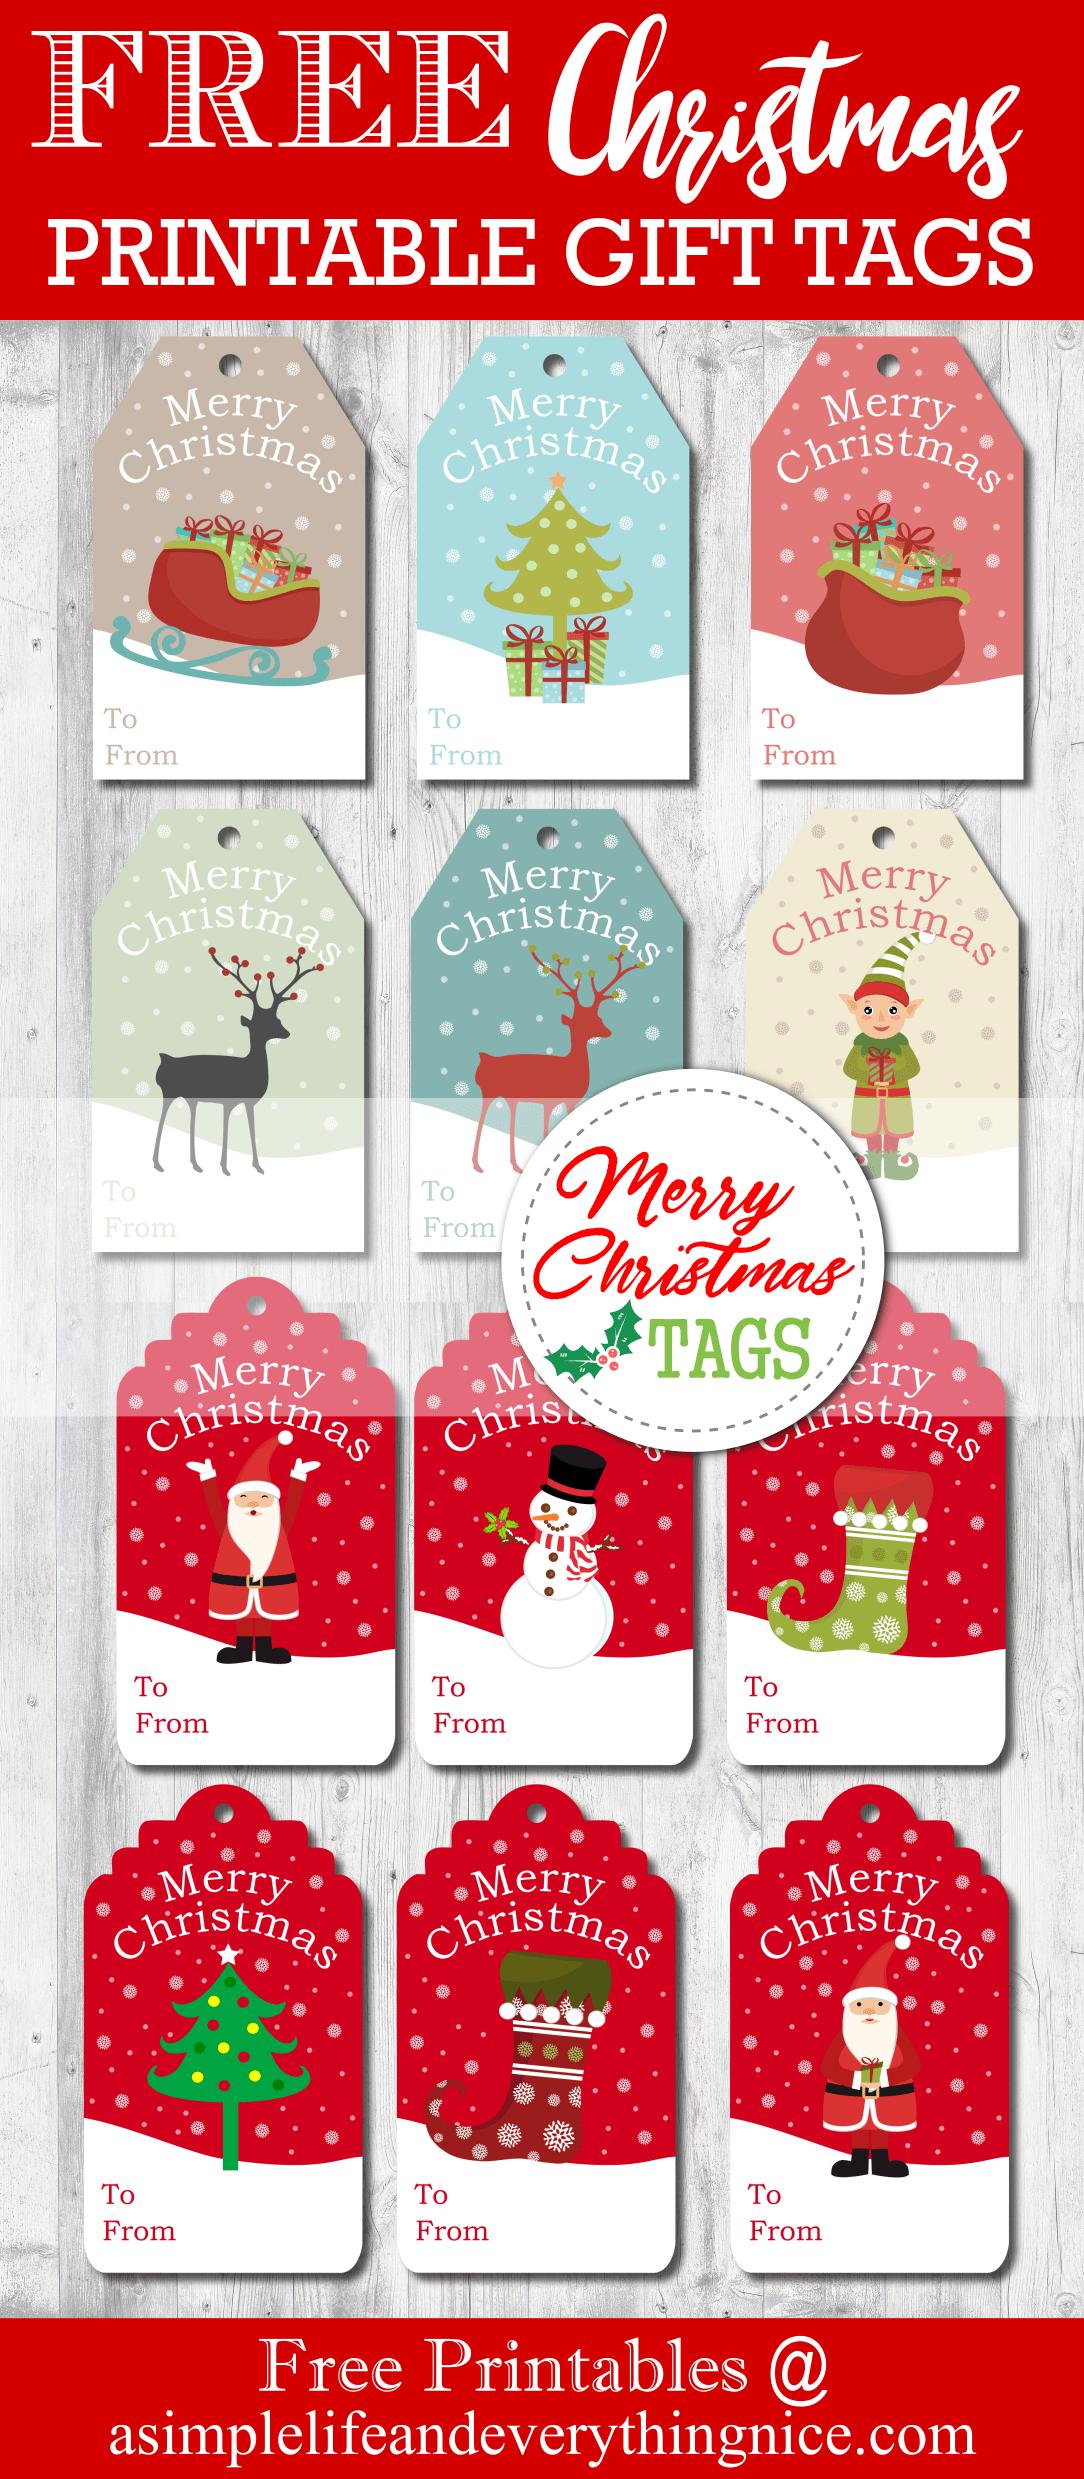 photo regarding Free Christmas Tag Printable titled Totally free Printable Xmas Reward Tags - A Straightforward Daily life and